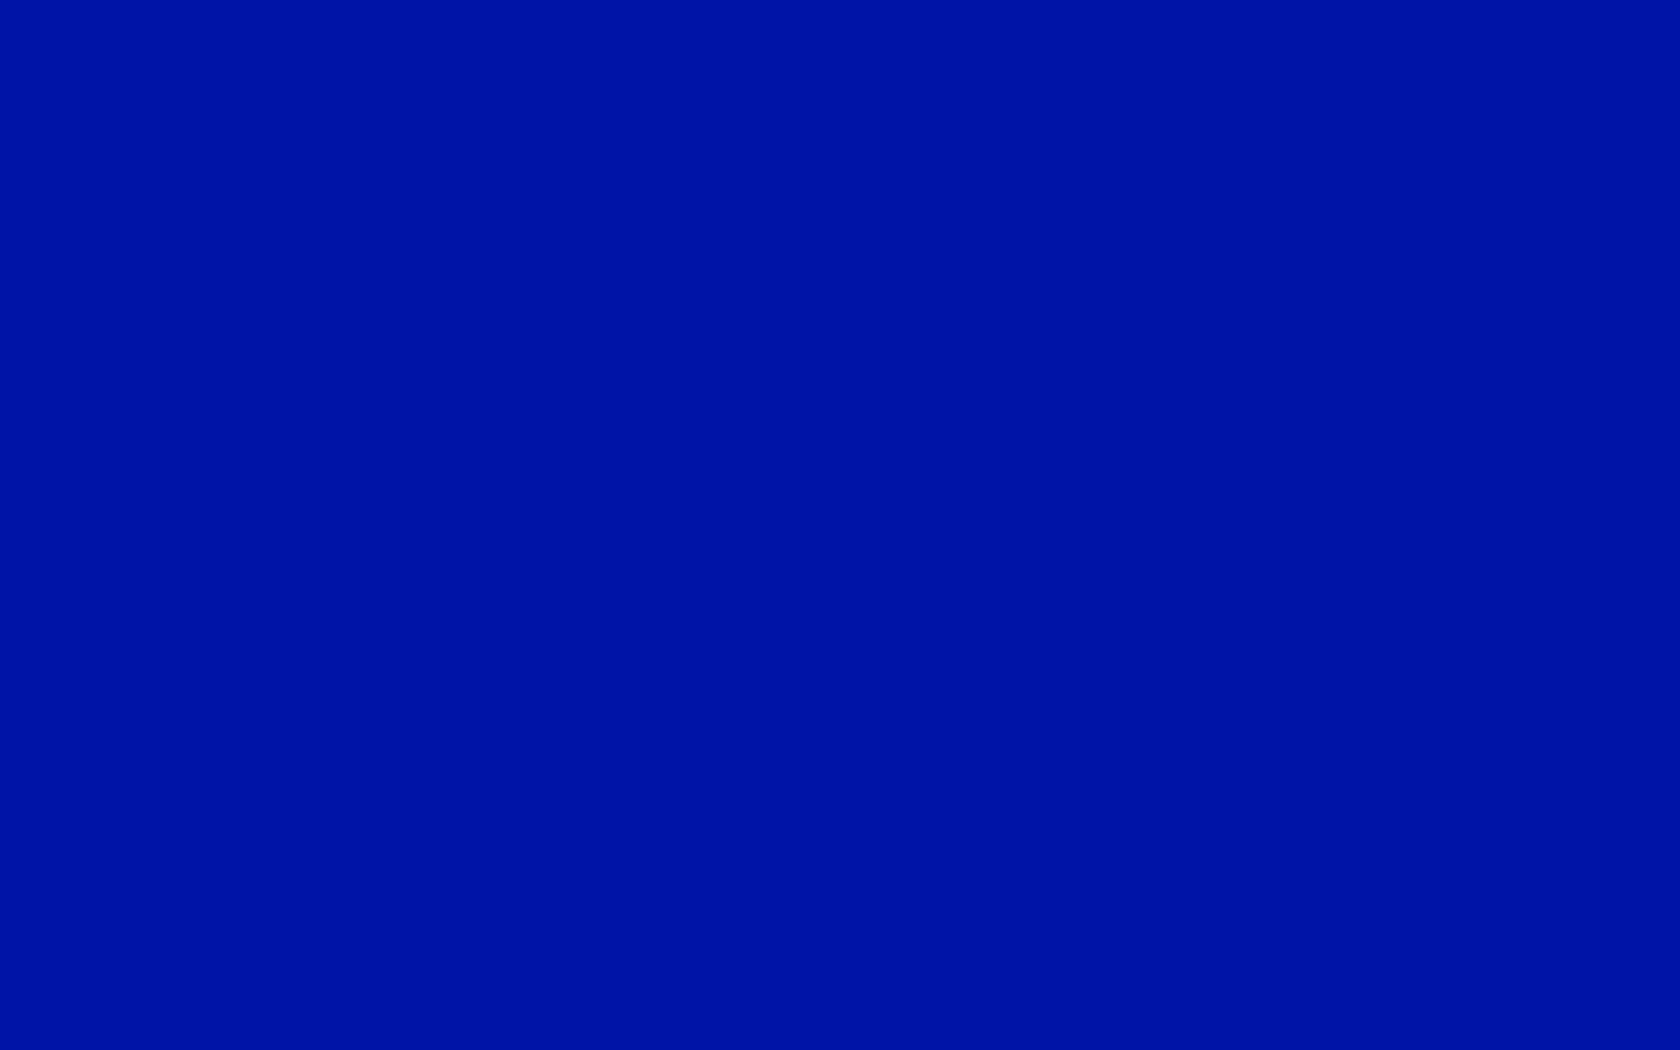 1680x1050 Zaffre Solid Color Background